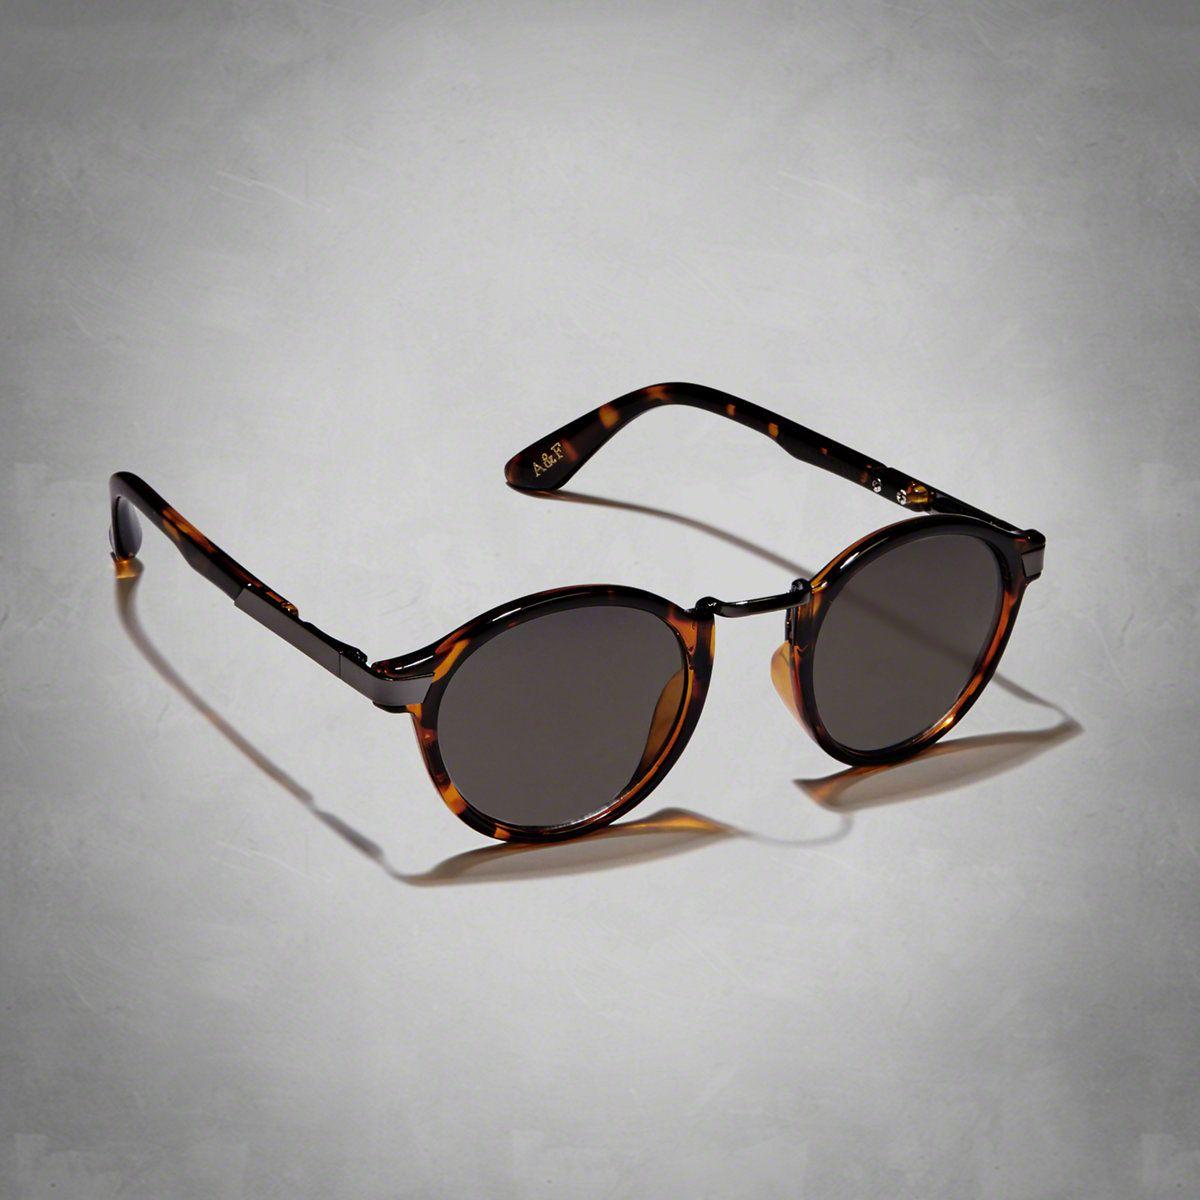 Womens Round Vintage Sunglasses | Vintage Round style, tortoise shell pattern frame | Womens Summer Getaways | Abercrombie.com